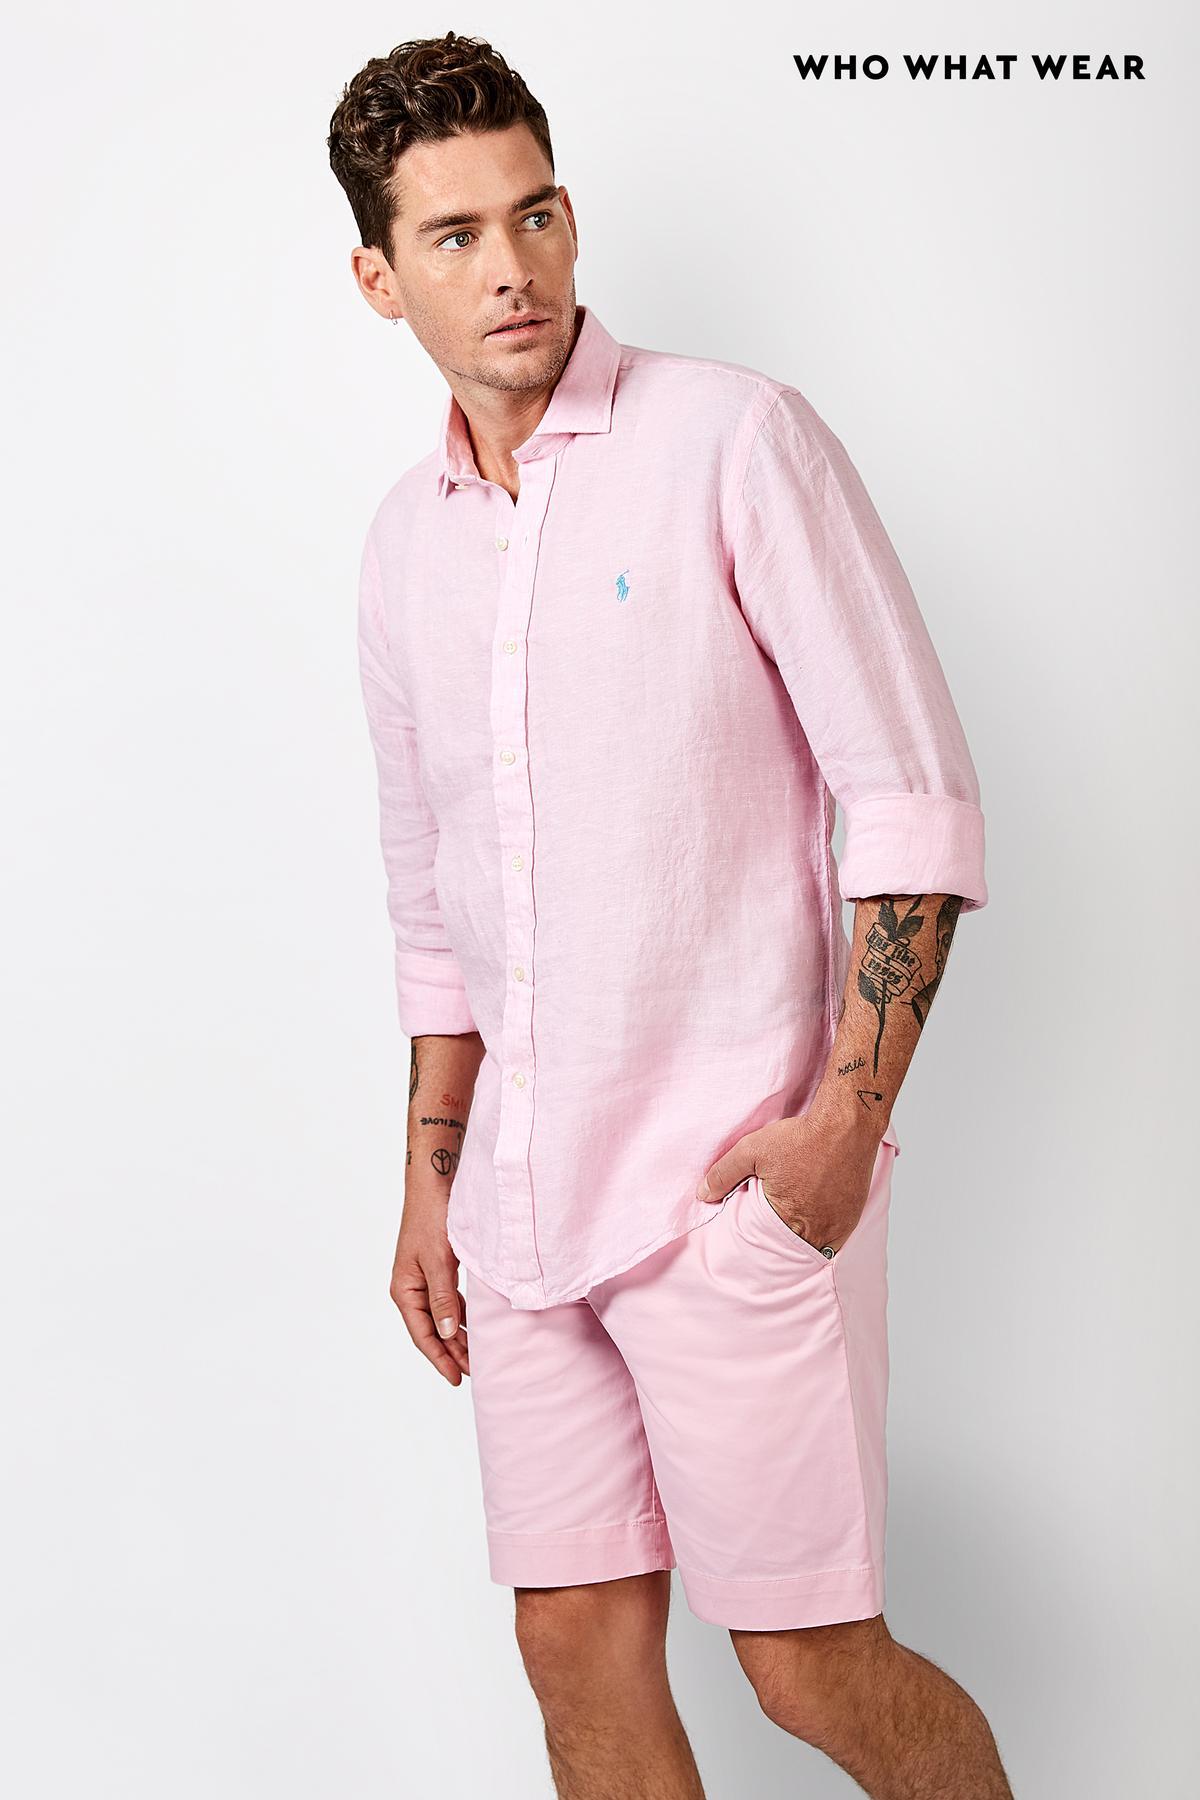 "<p><em><strong>Joliffe wears:</strong> Polo Ralph Lauren <a href=""https://www.theiconic.com.au/classic-fit-linen-shirt-652679.html"" target=""_blank"">Men's Classic Fit Linen Shirt </a>($179), Polo..."